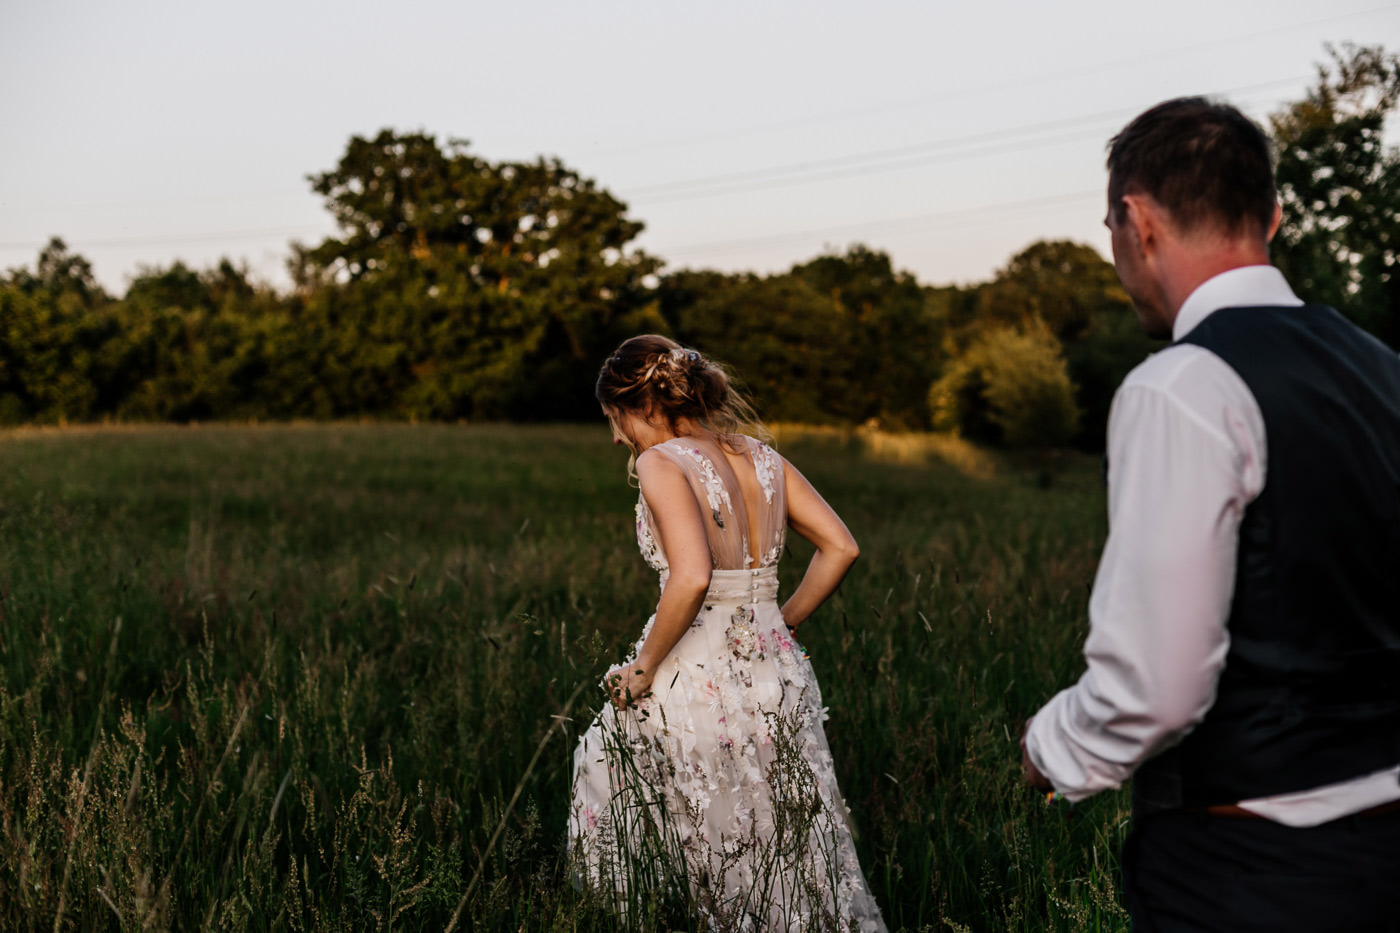 Sorrento destination wedding photographer